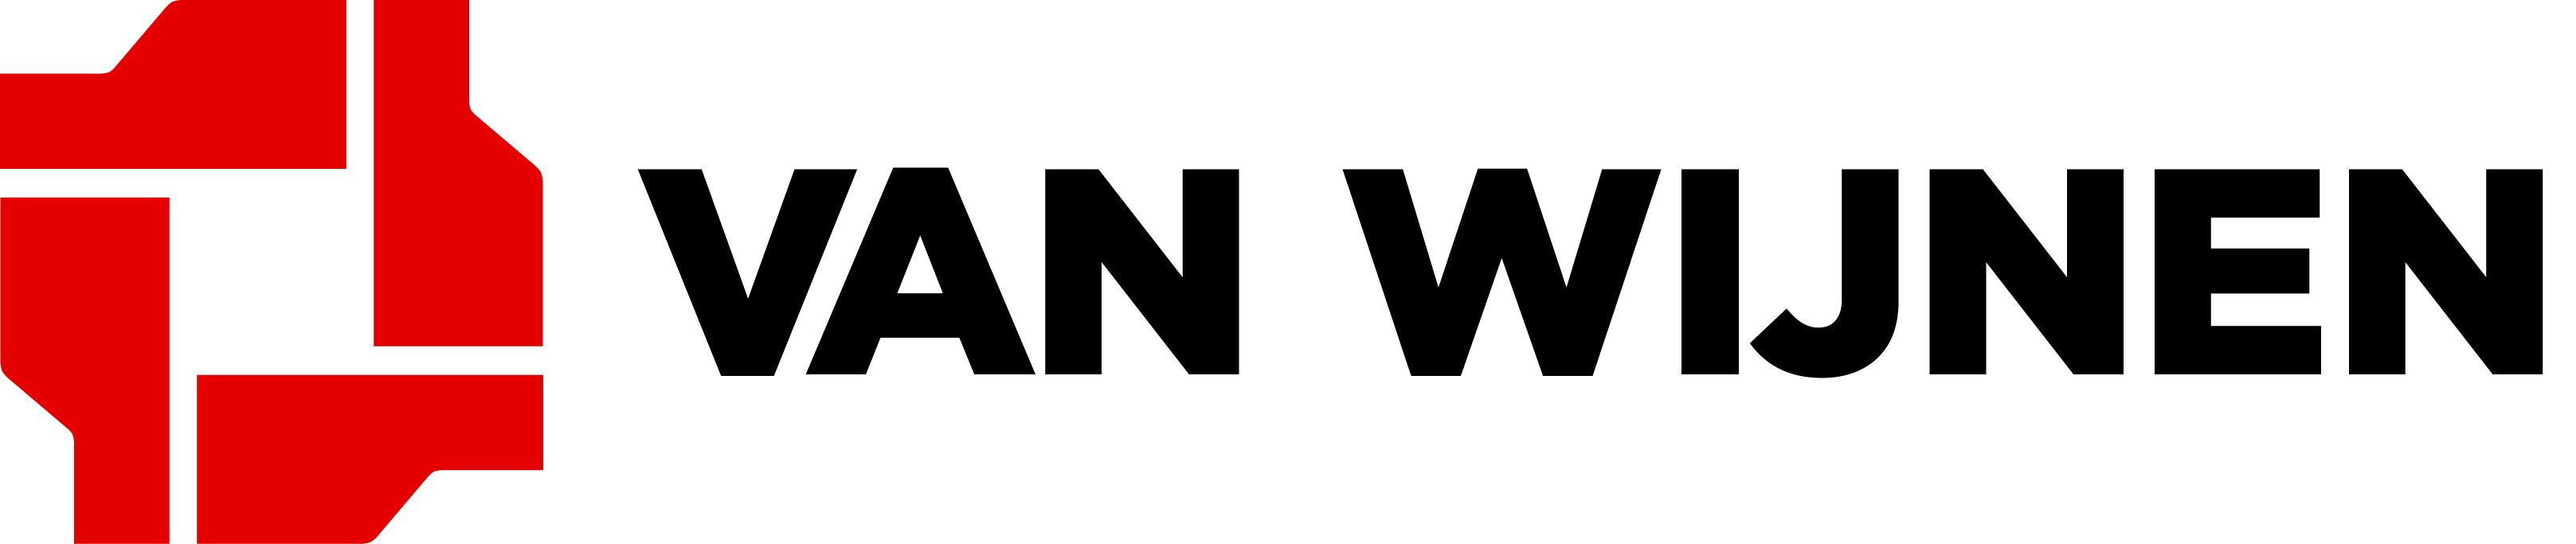 316381 logo%20van%20wijnen 5d2e2f original 1559679645